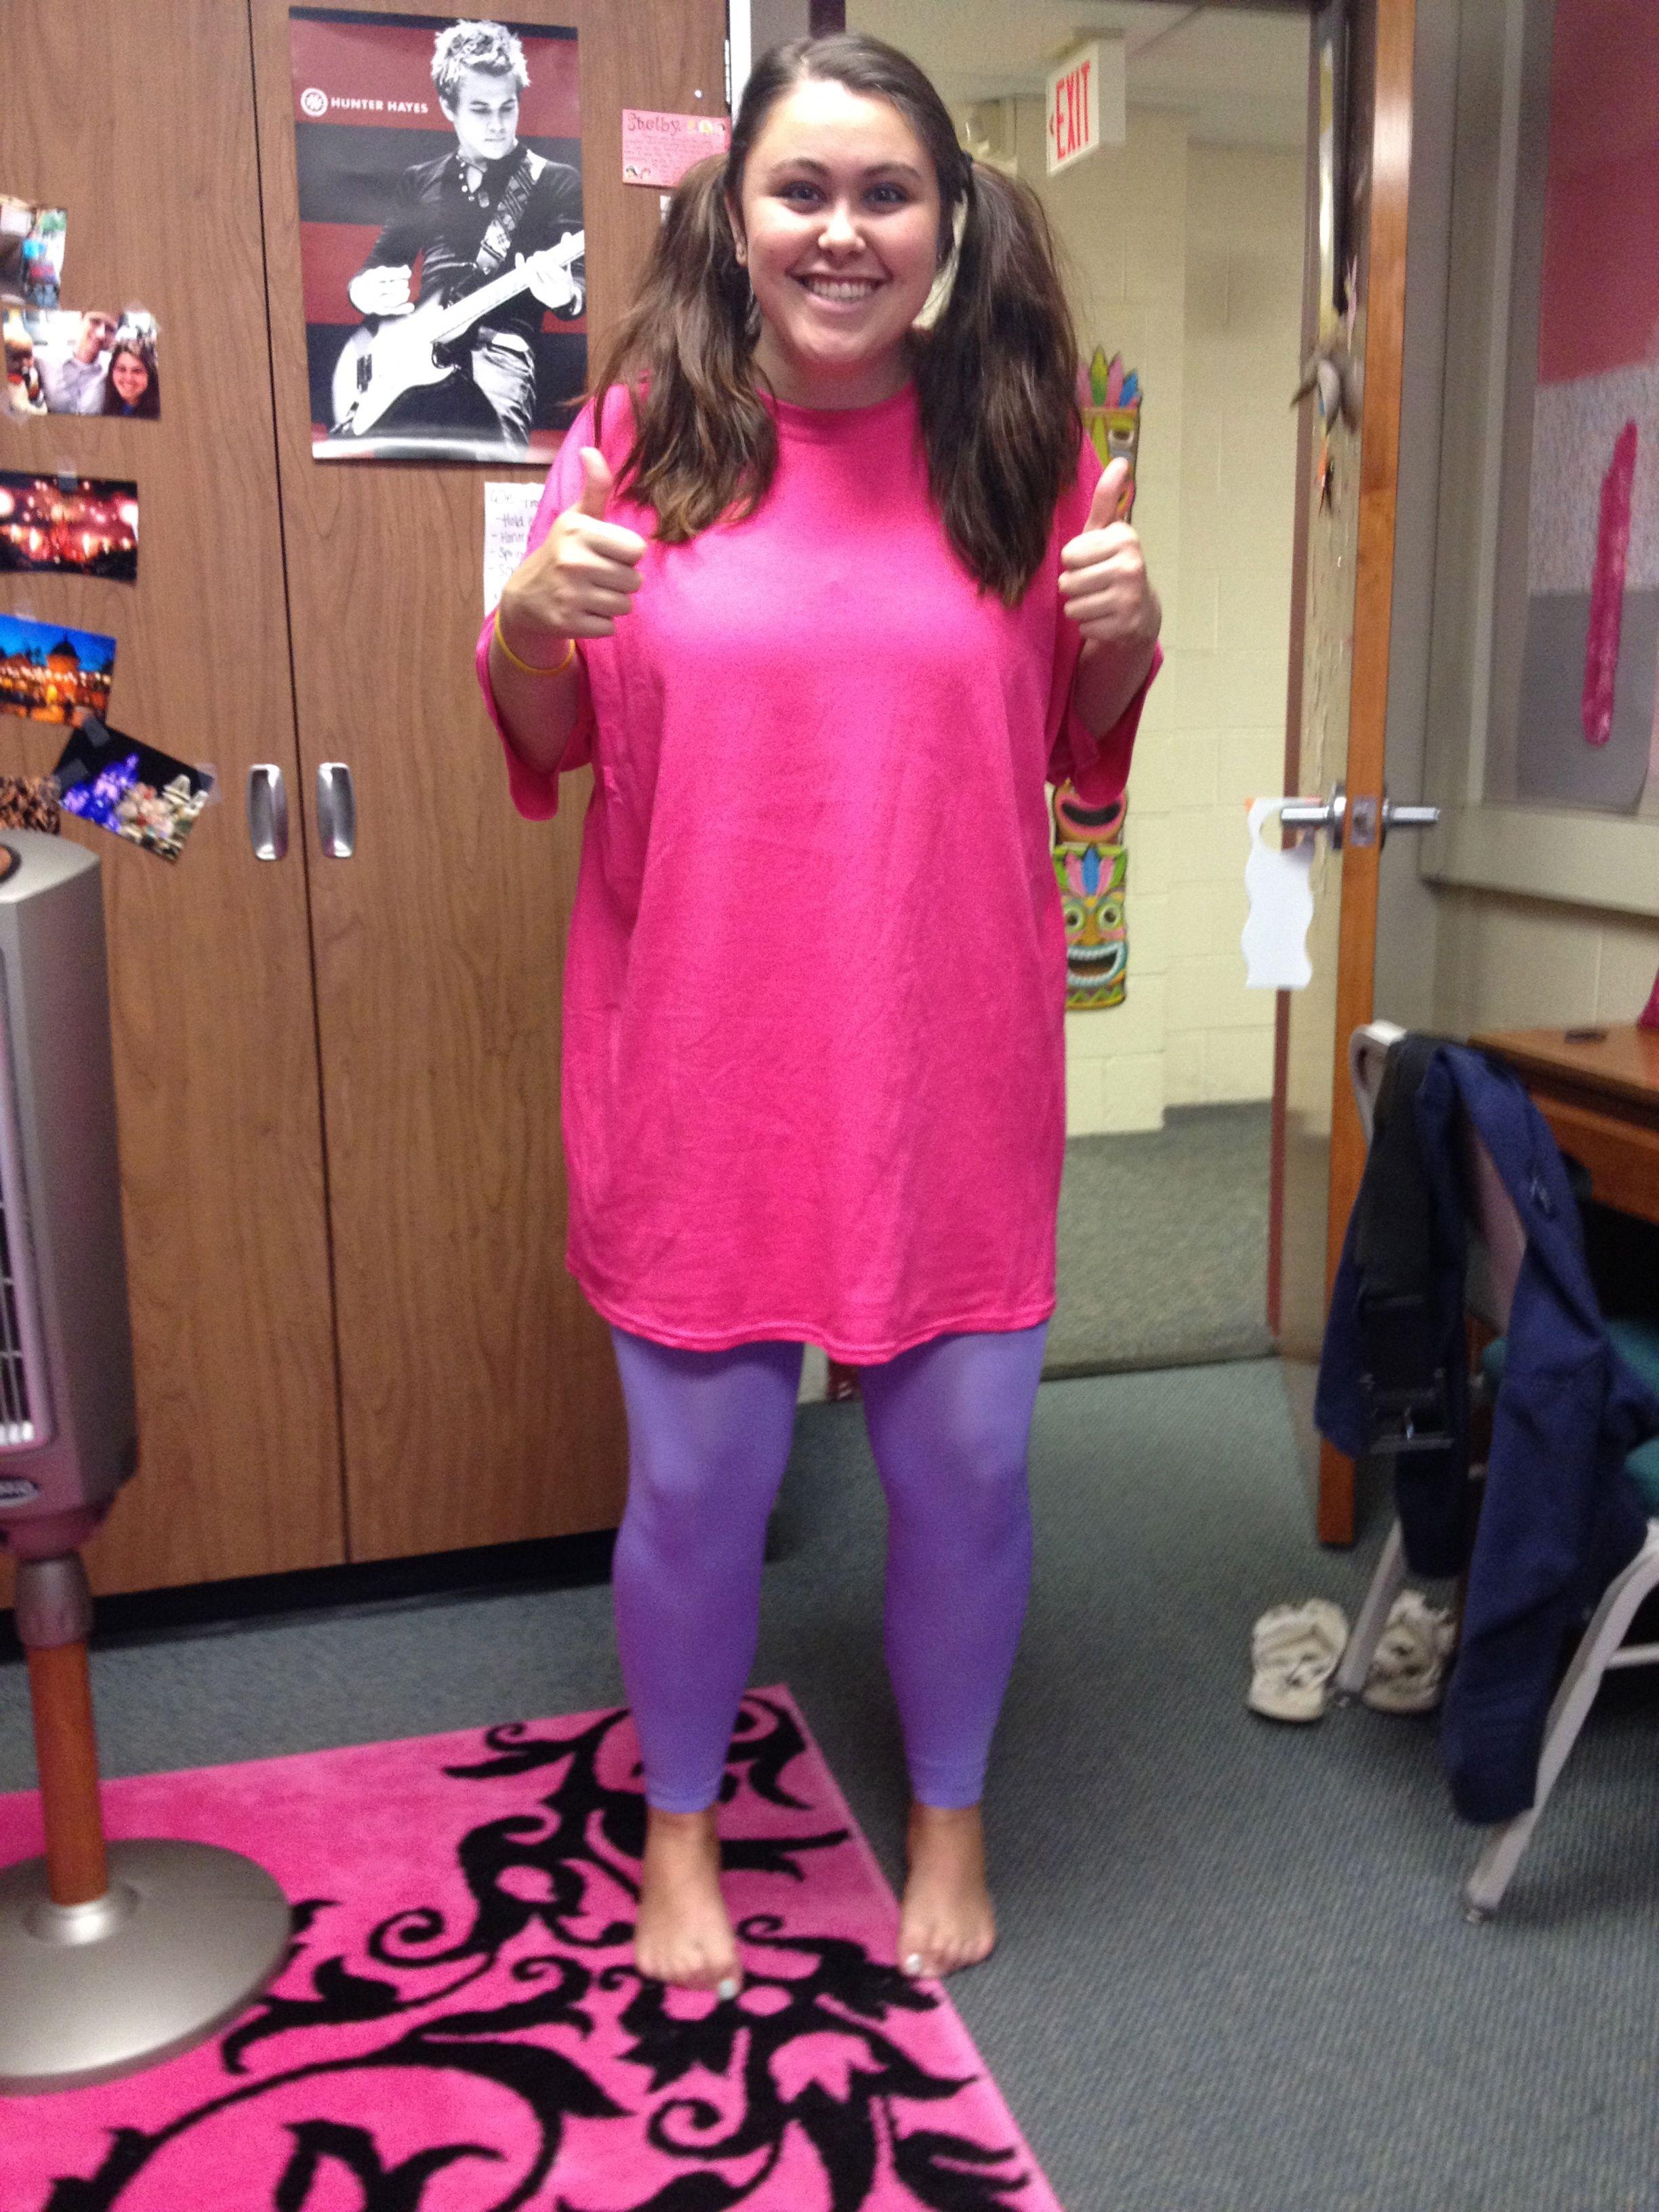 6d2f572ba48 Boo is the perfect halloween costume!! Just add some oversized socks  )   disney  boo  monstersinc.  love